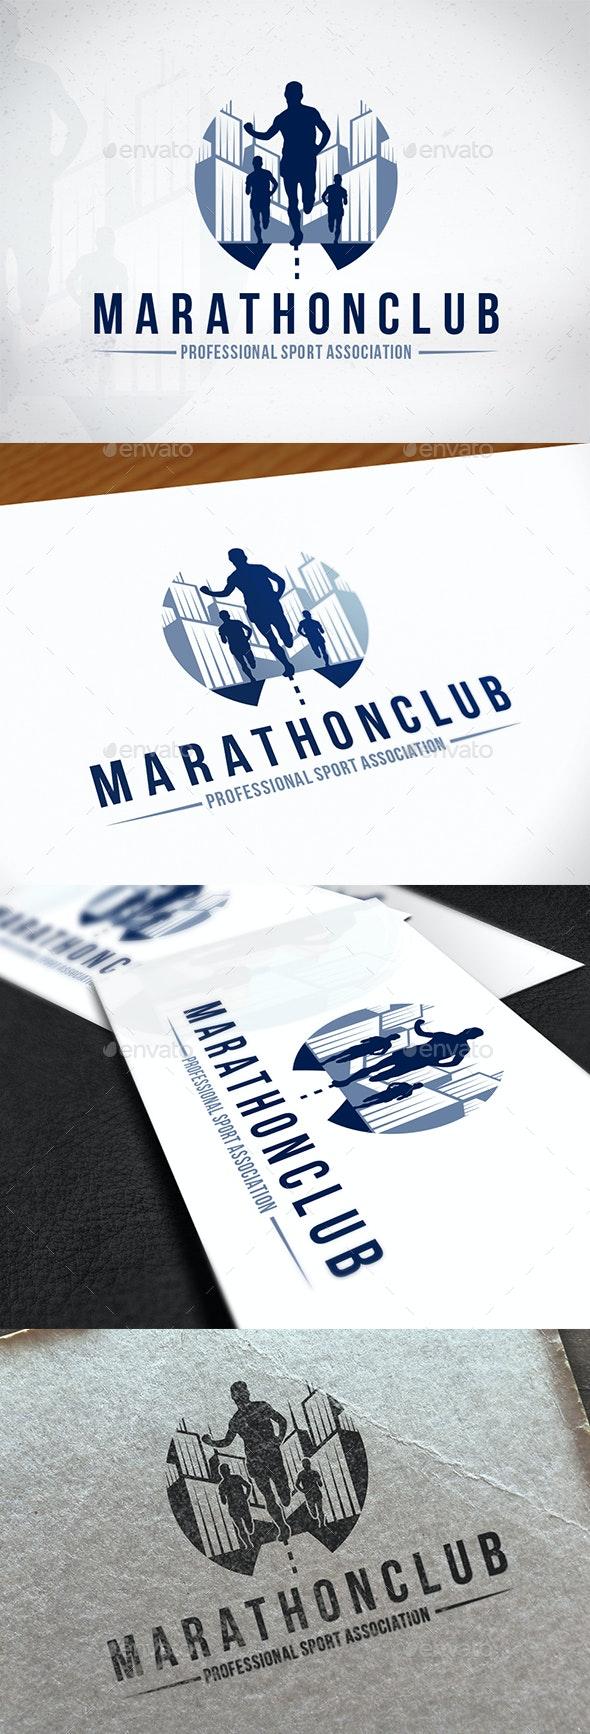 Marathon Club Logo Design - Sports Logo Templates